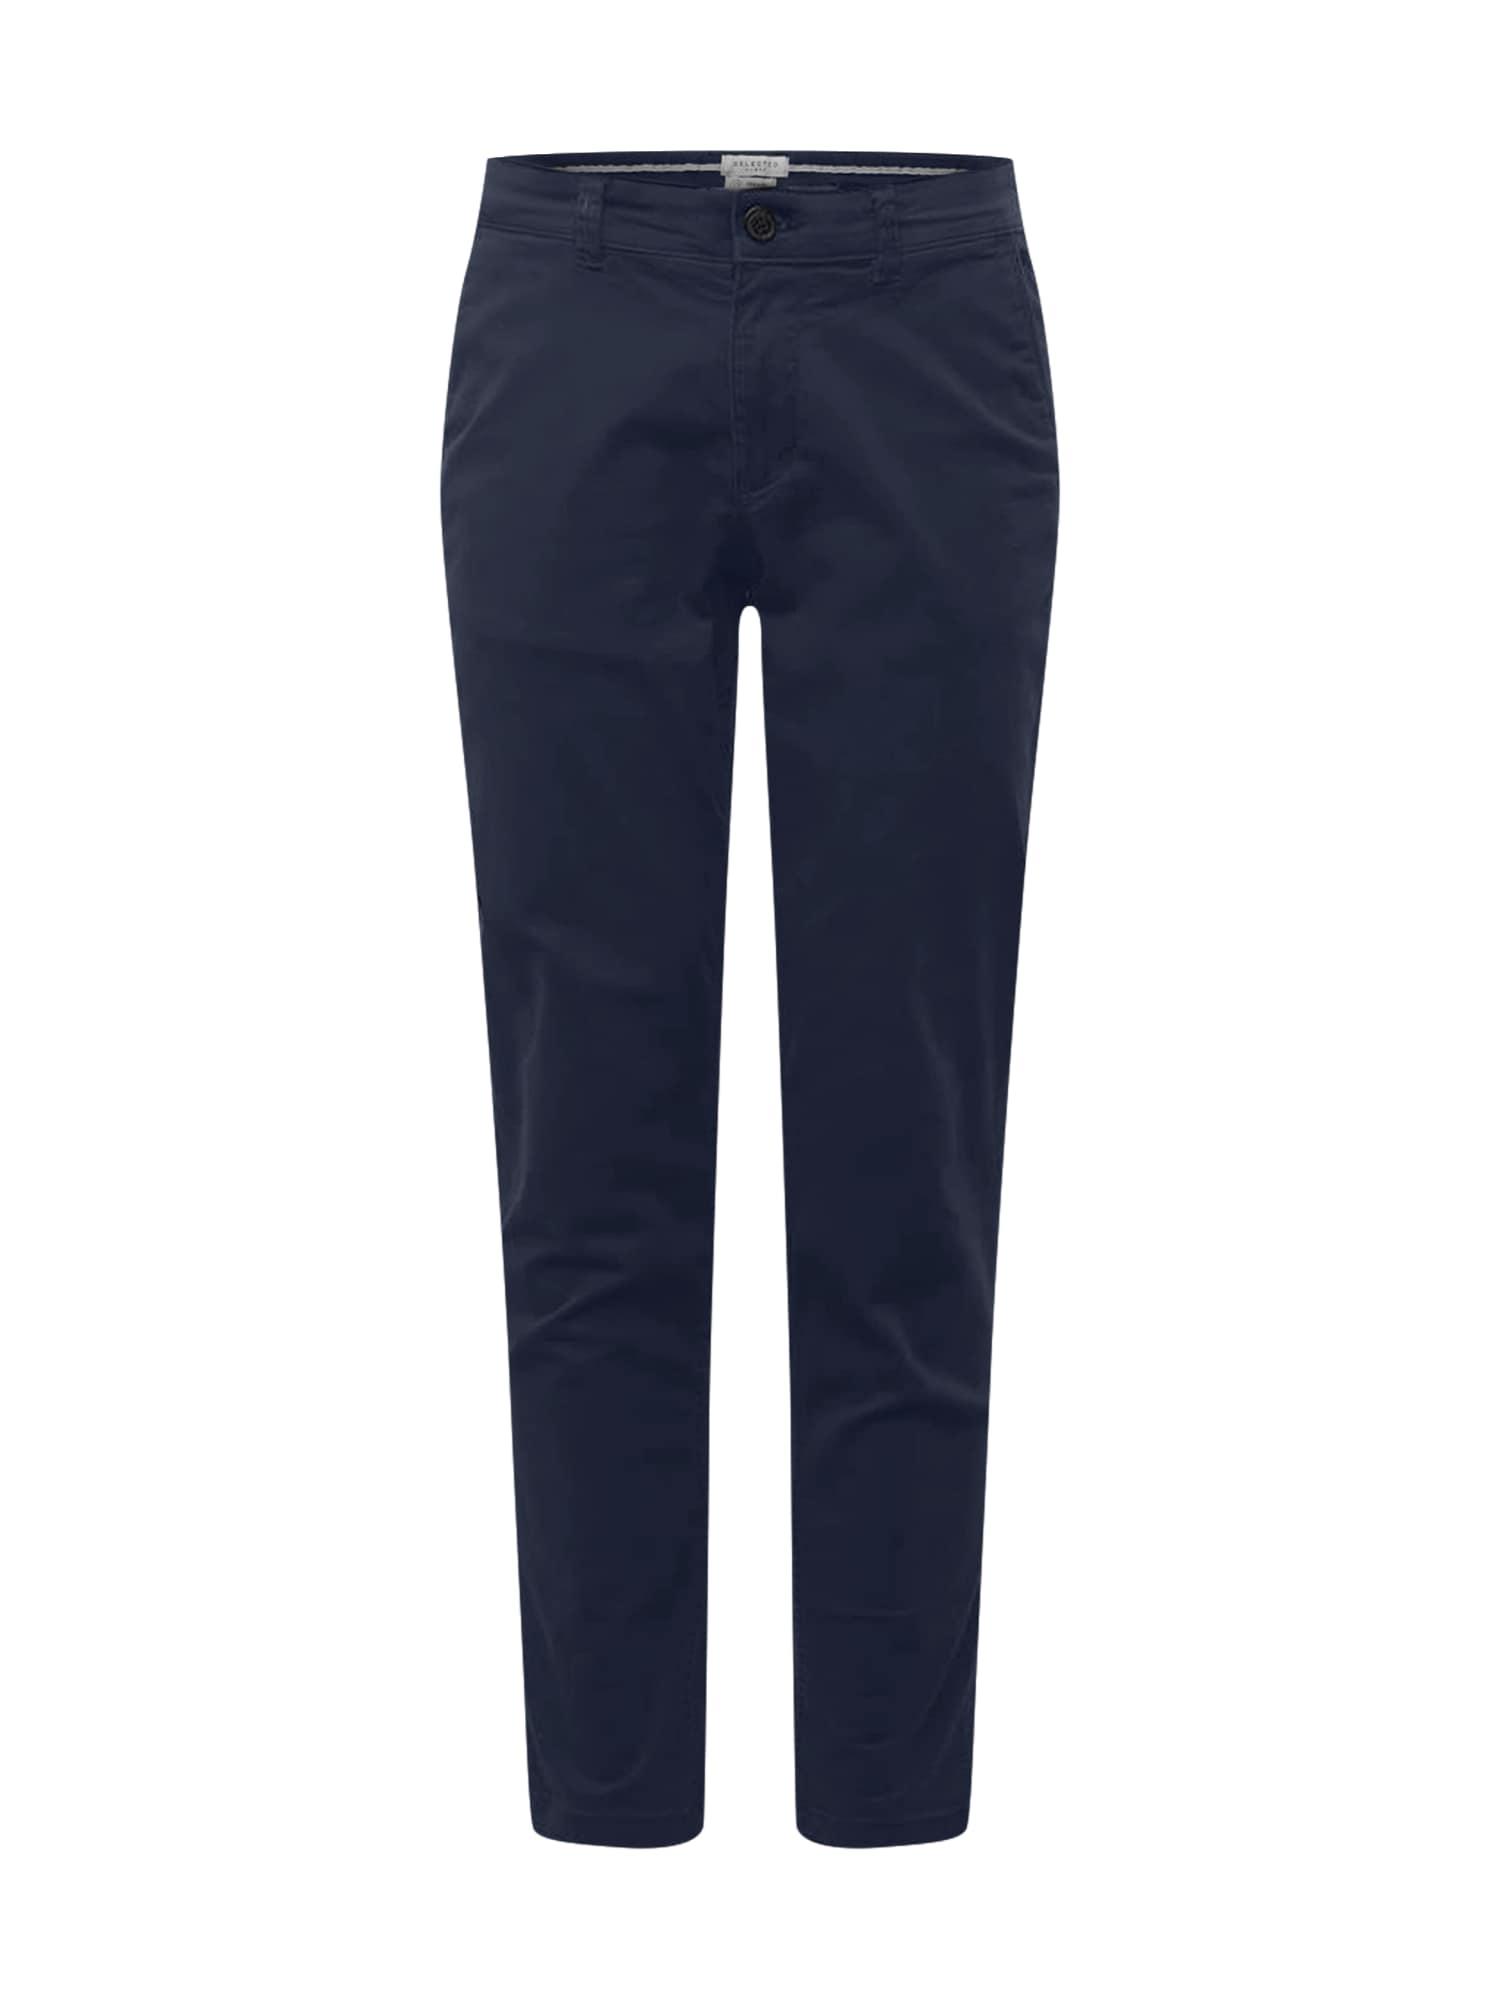 SELECTED HOMME Pantalon chino 'NEW PARIS'  - Bleu - Taille: 30 - male